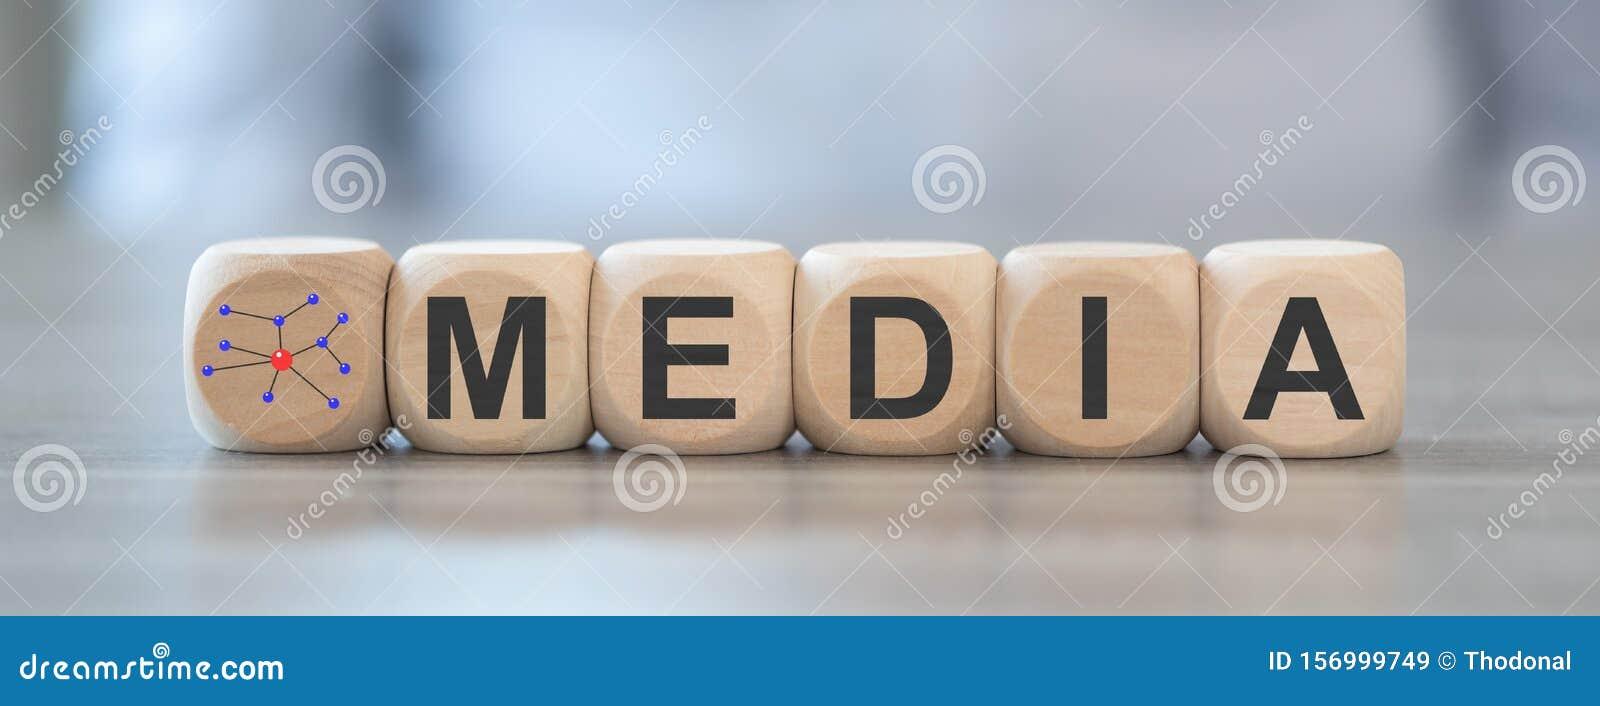 Concept of media